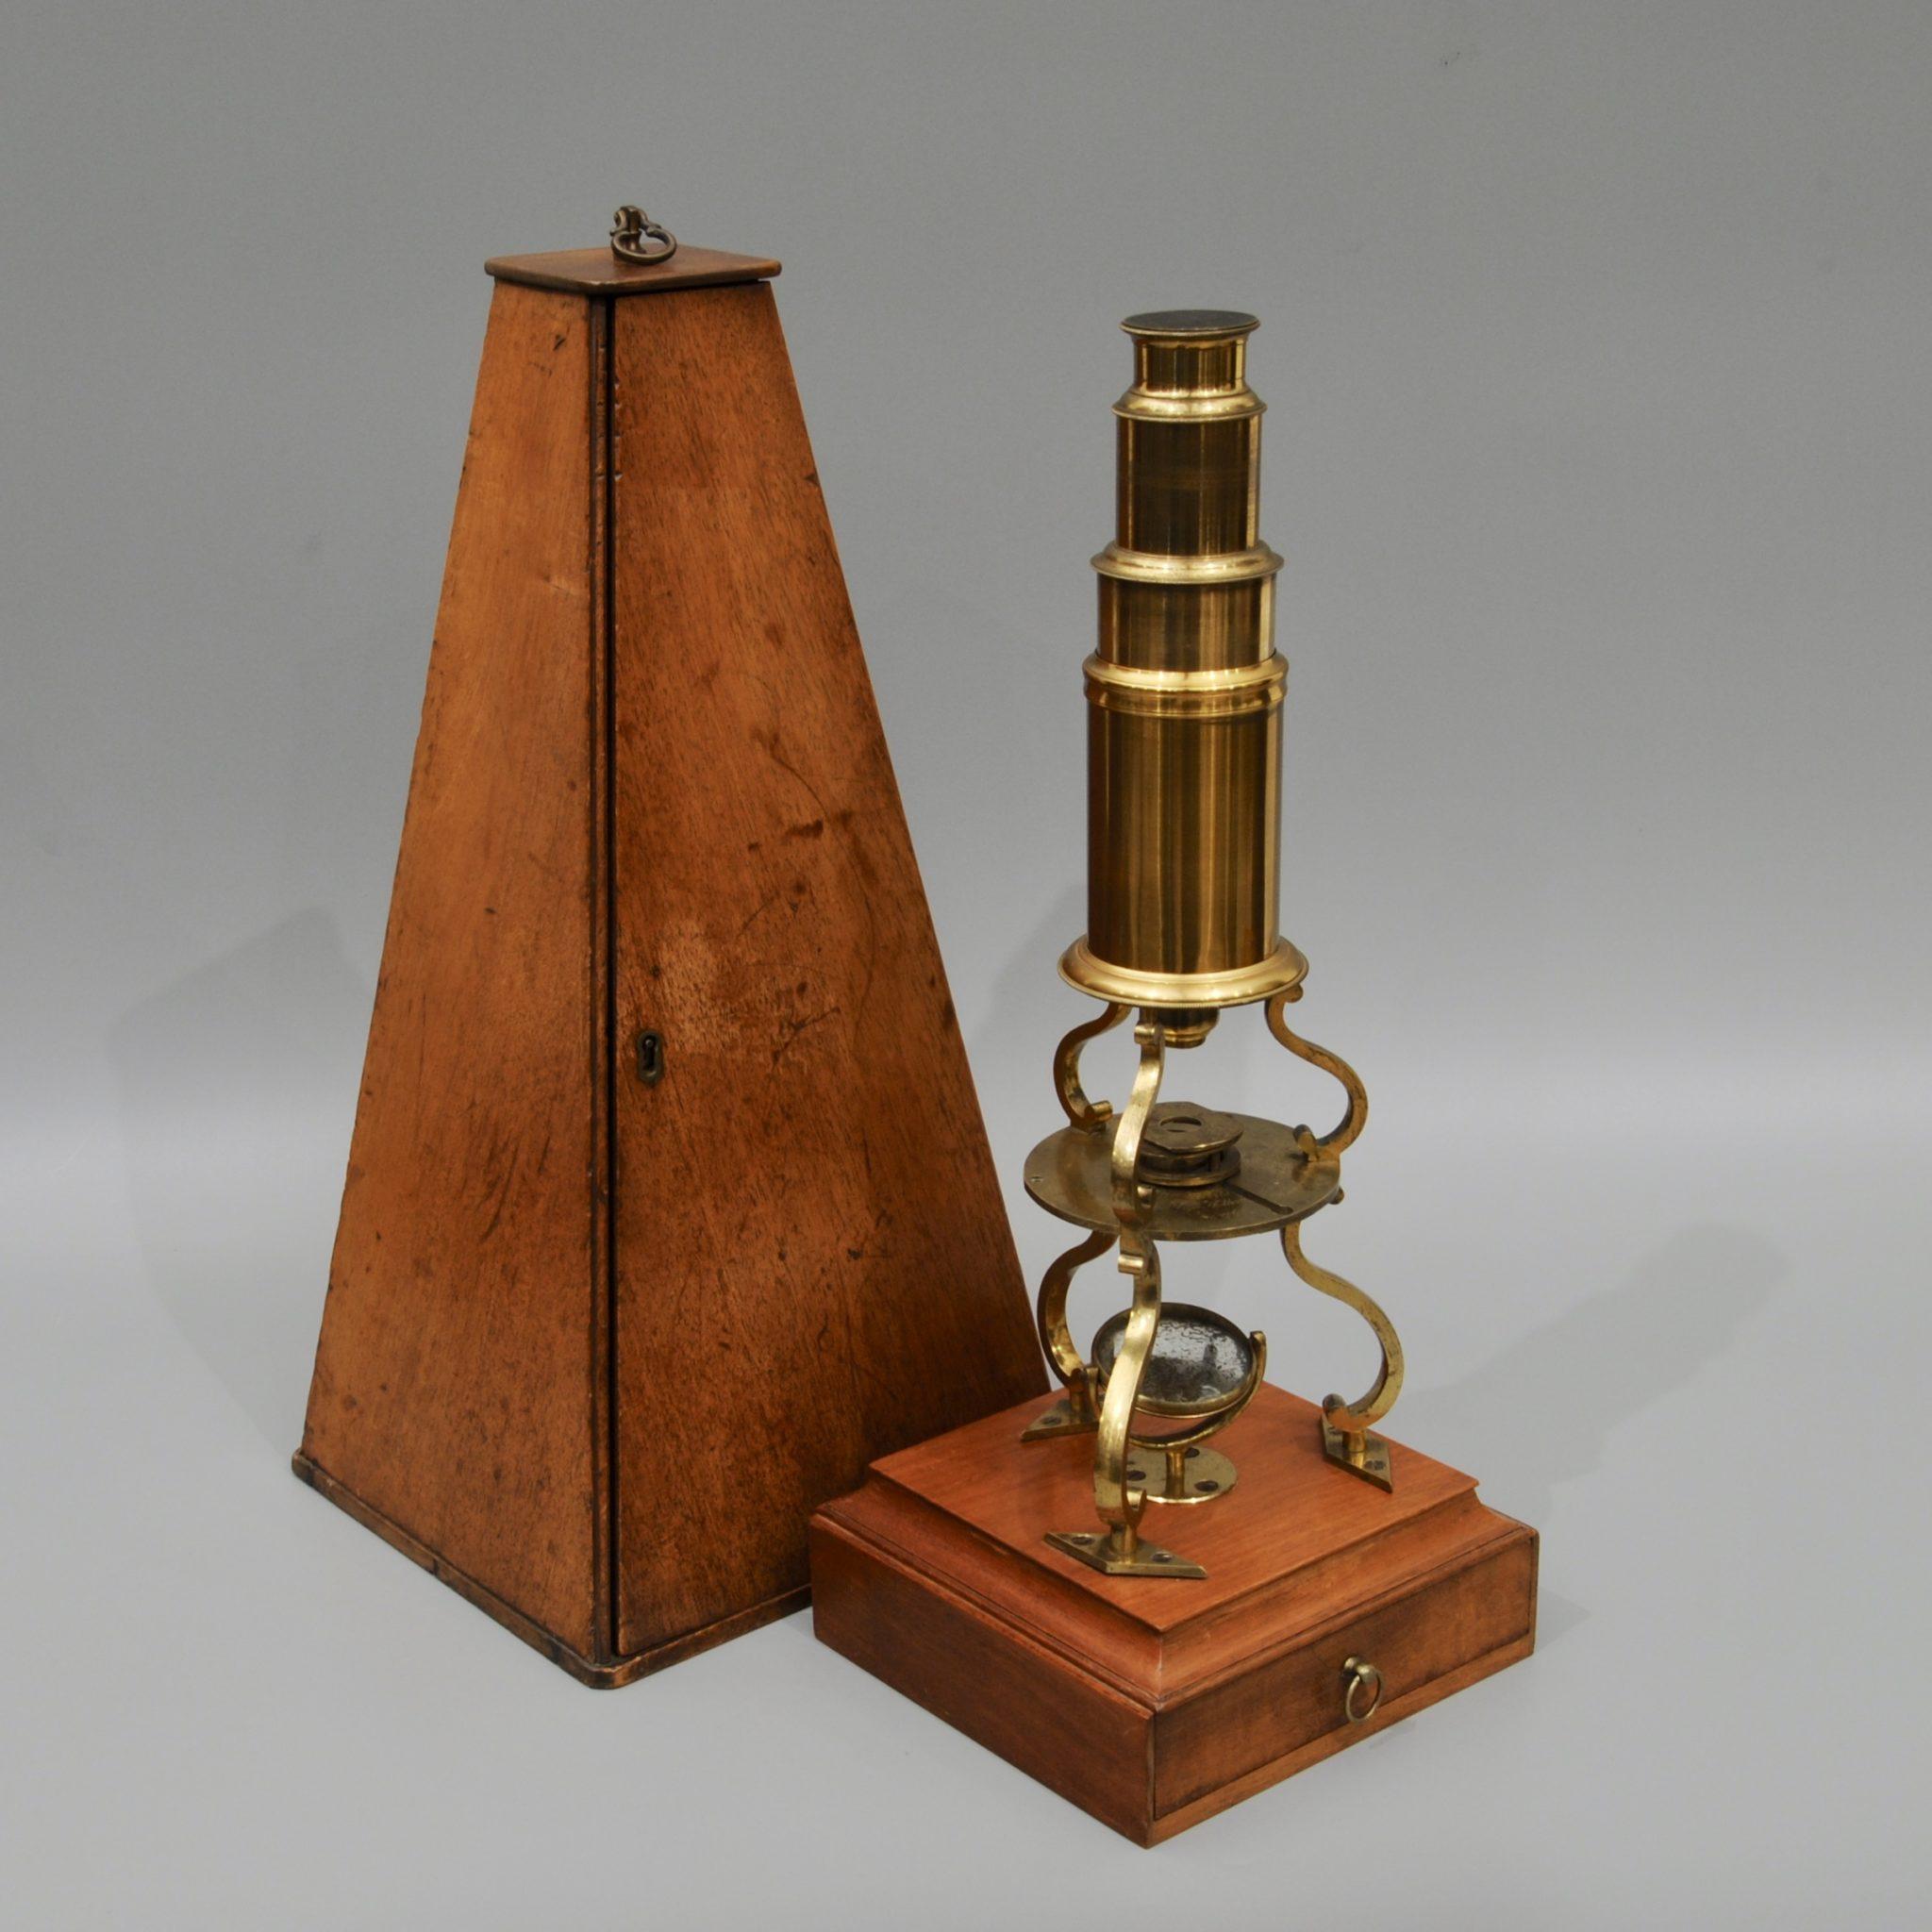 A very original Culpeper microscope by William Harris, London